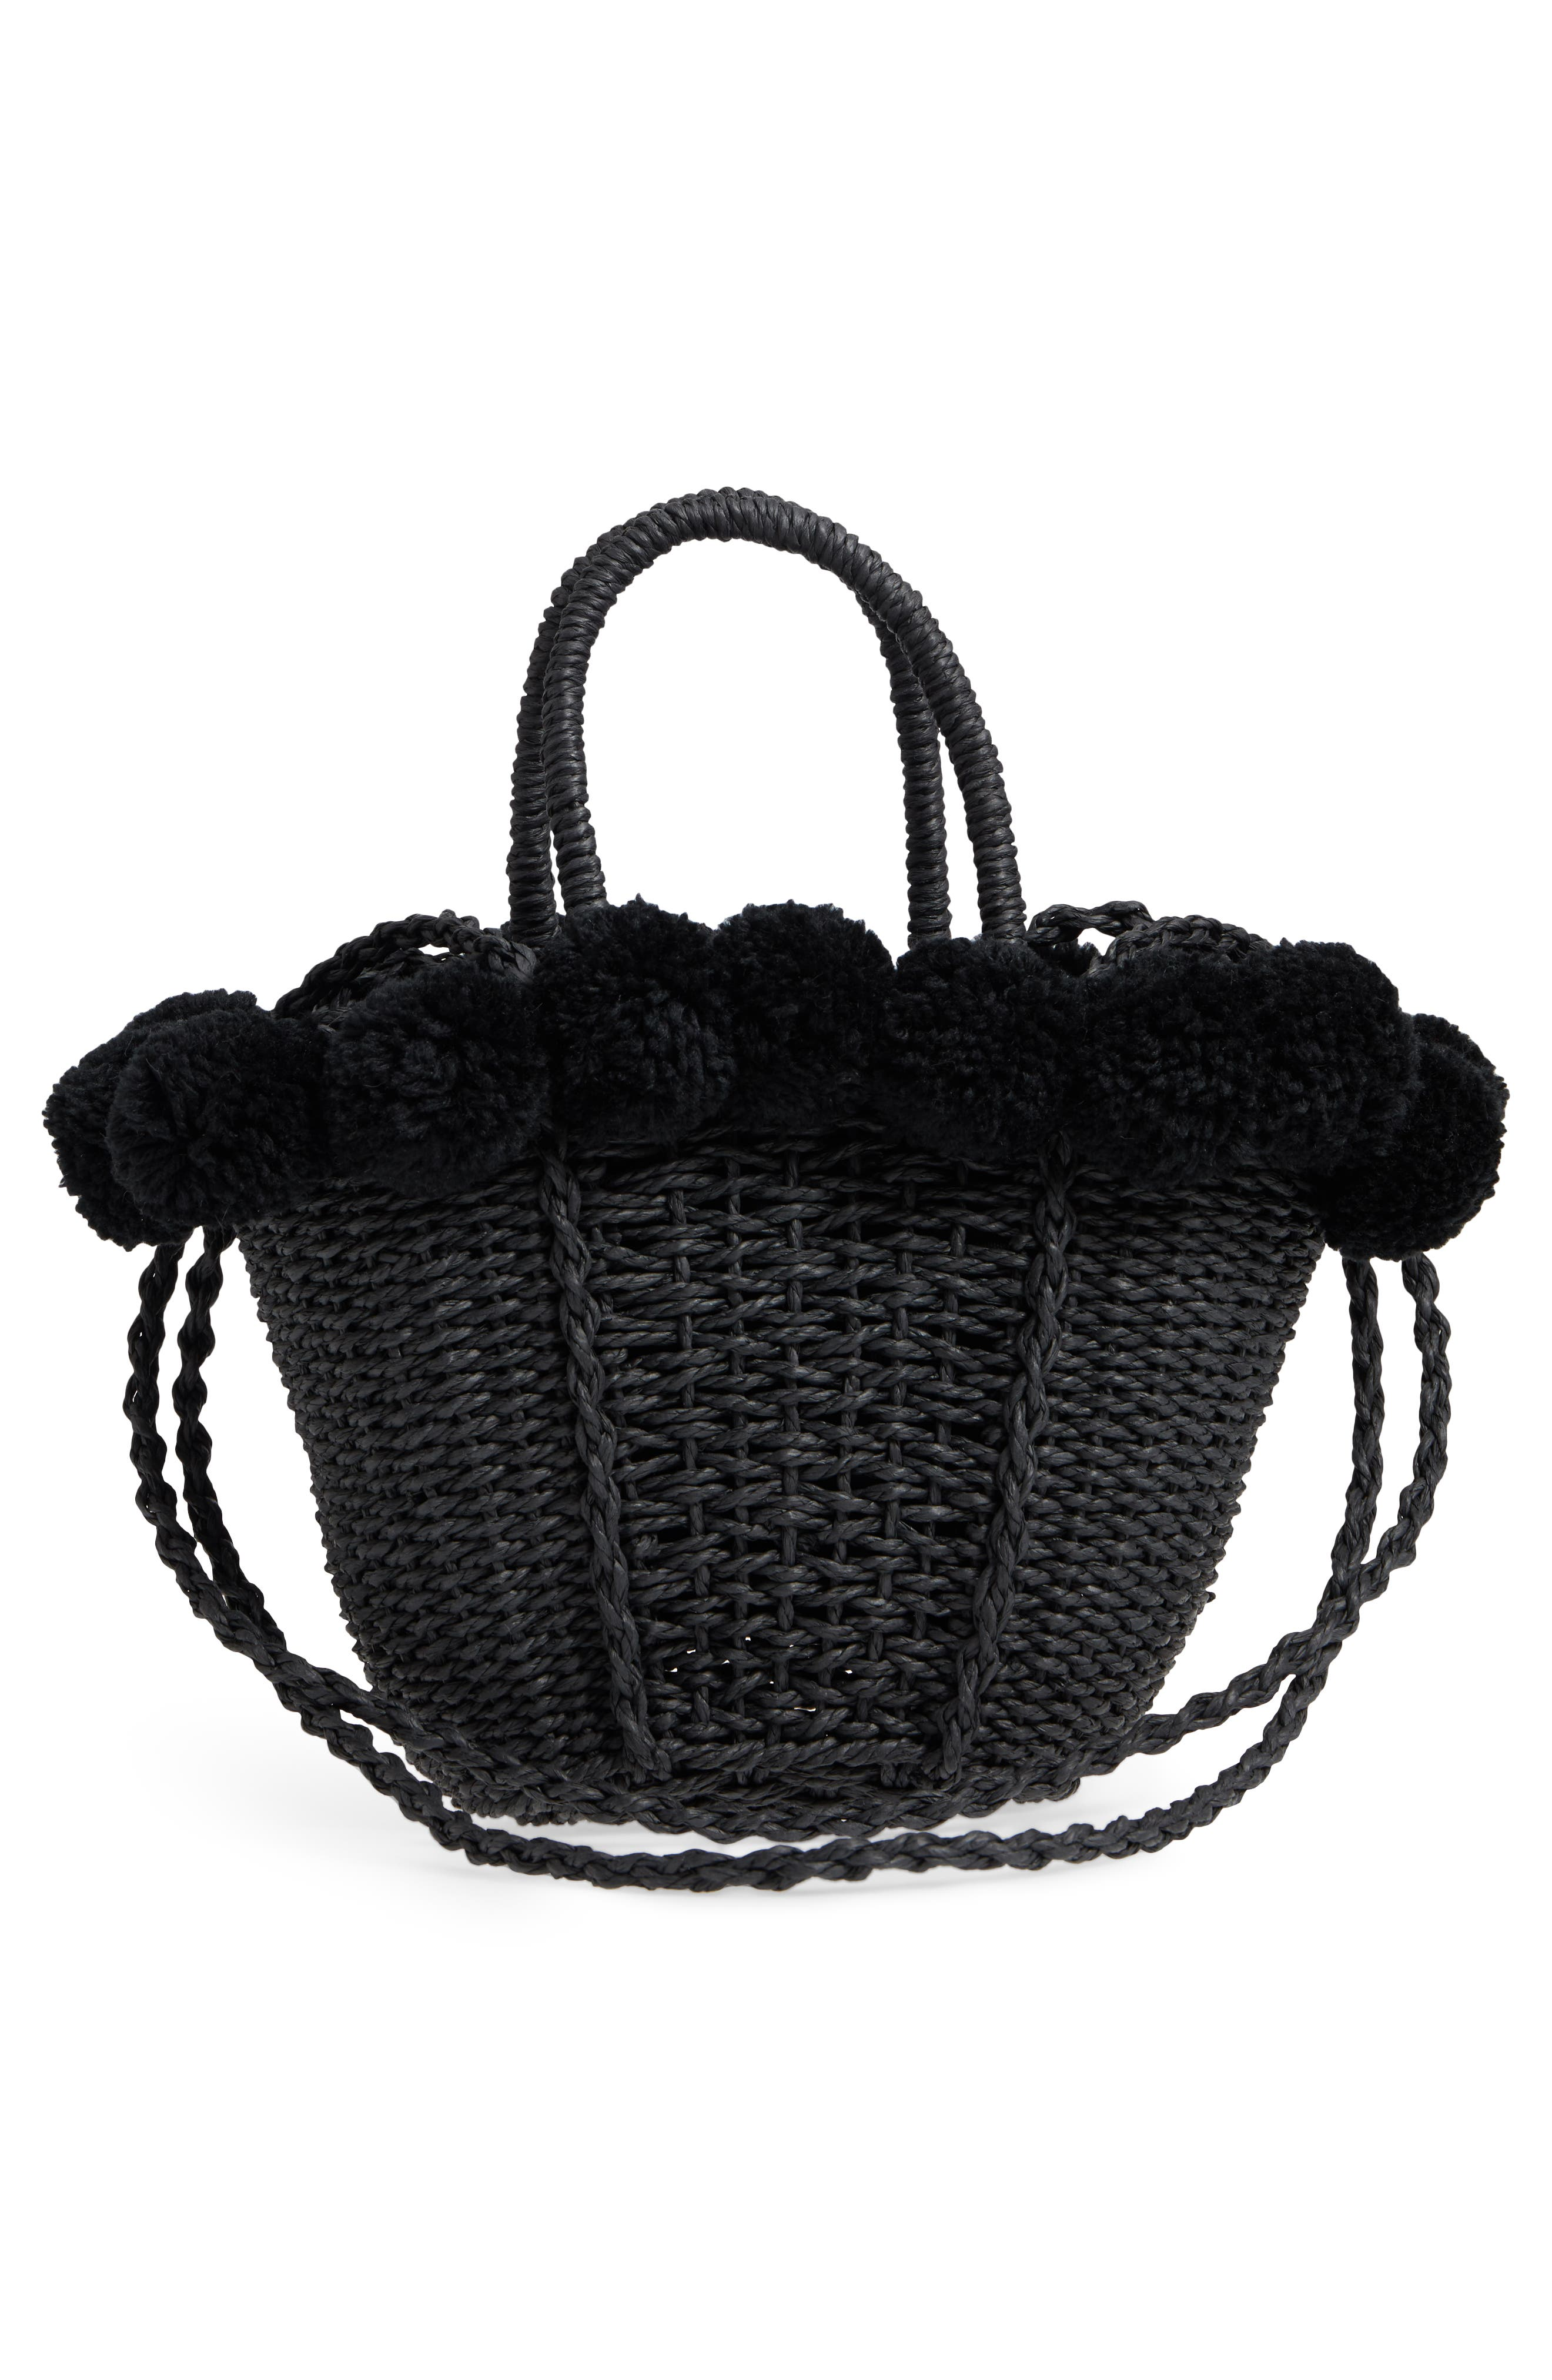 Sia Pom Straw Shopper Bag,                             Alternate thumbnail 3, color,                             Black